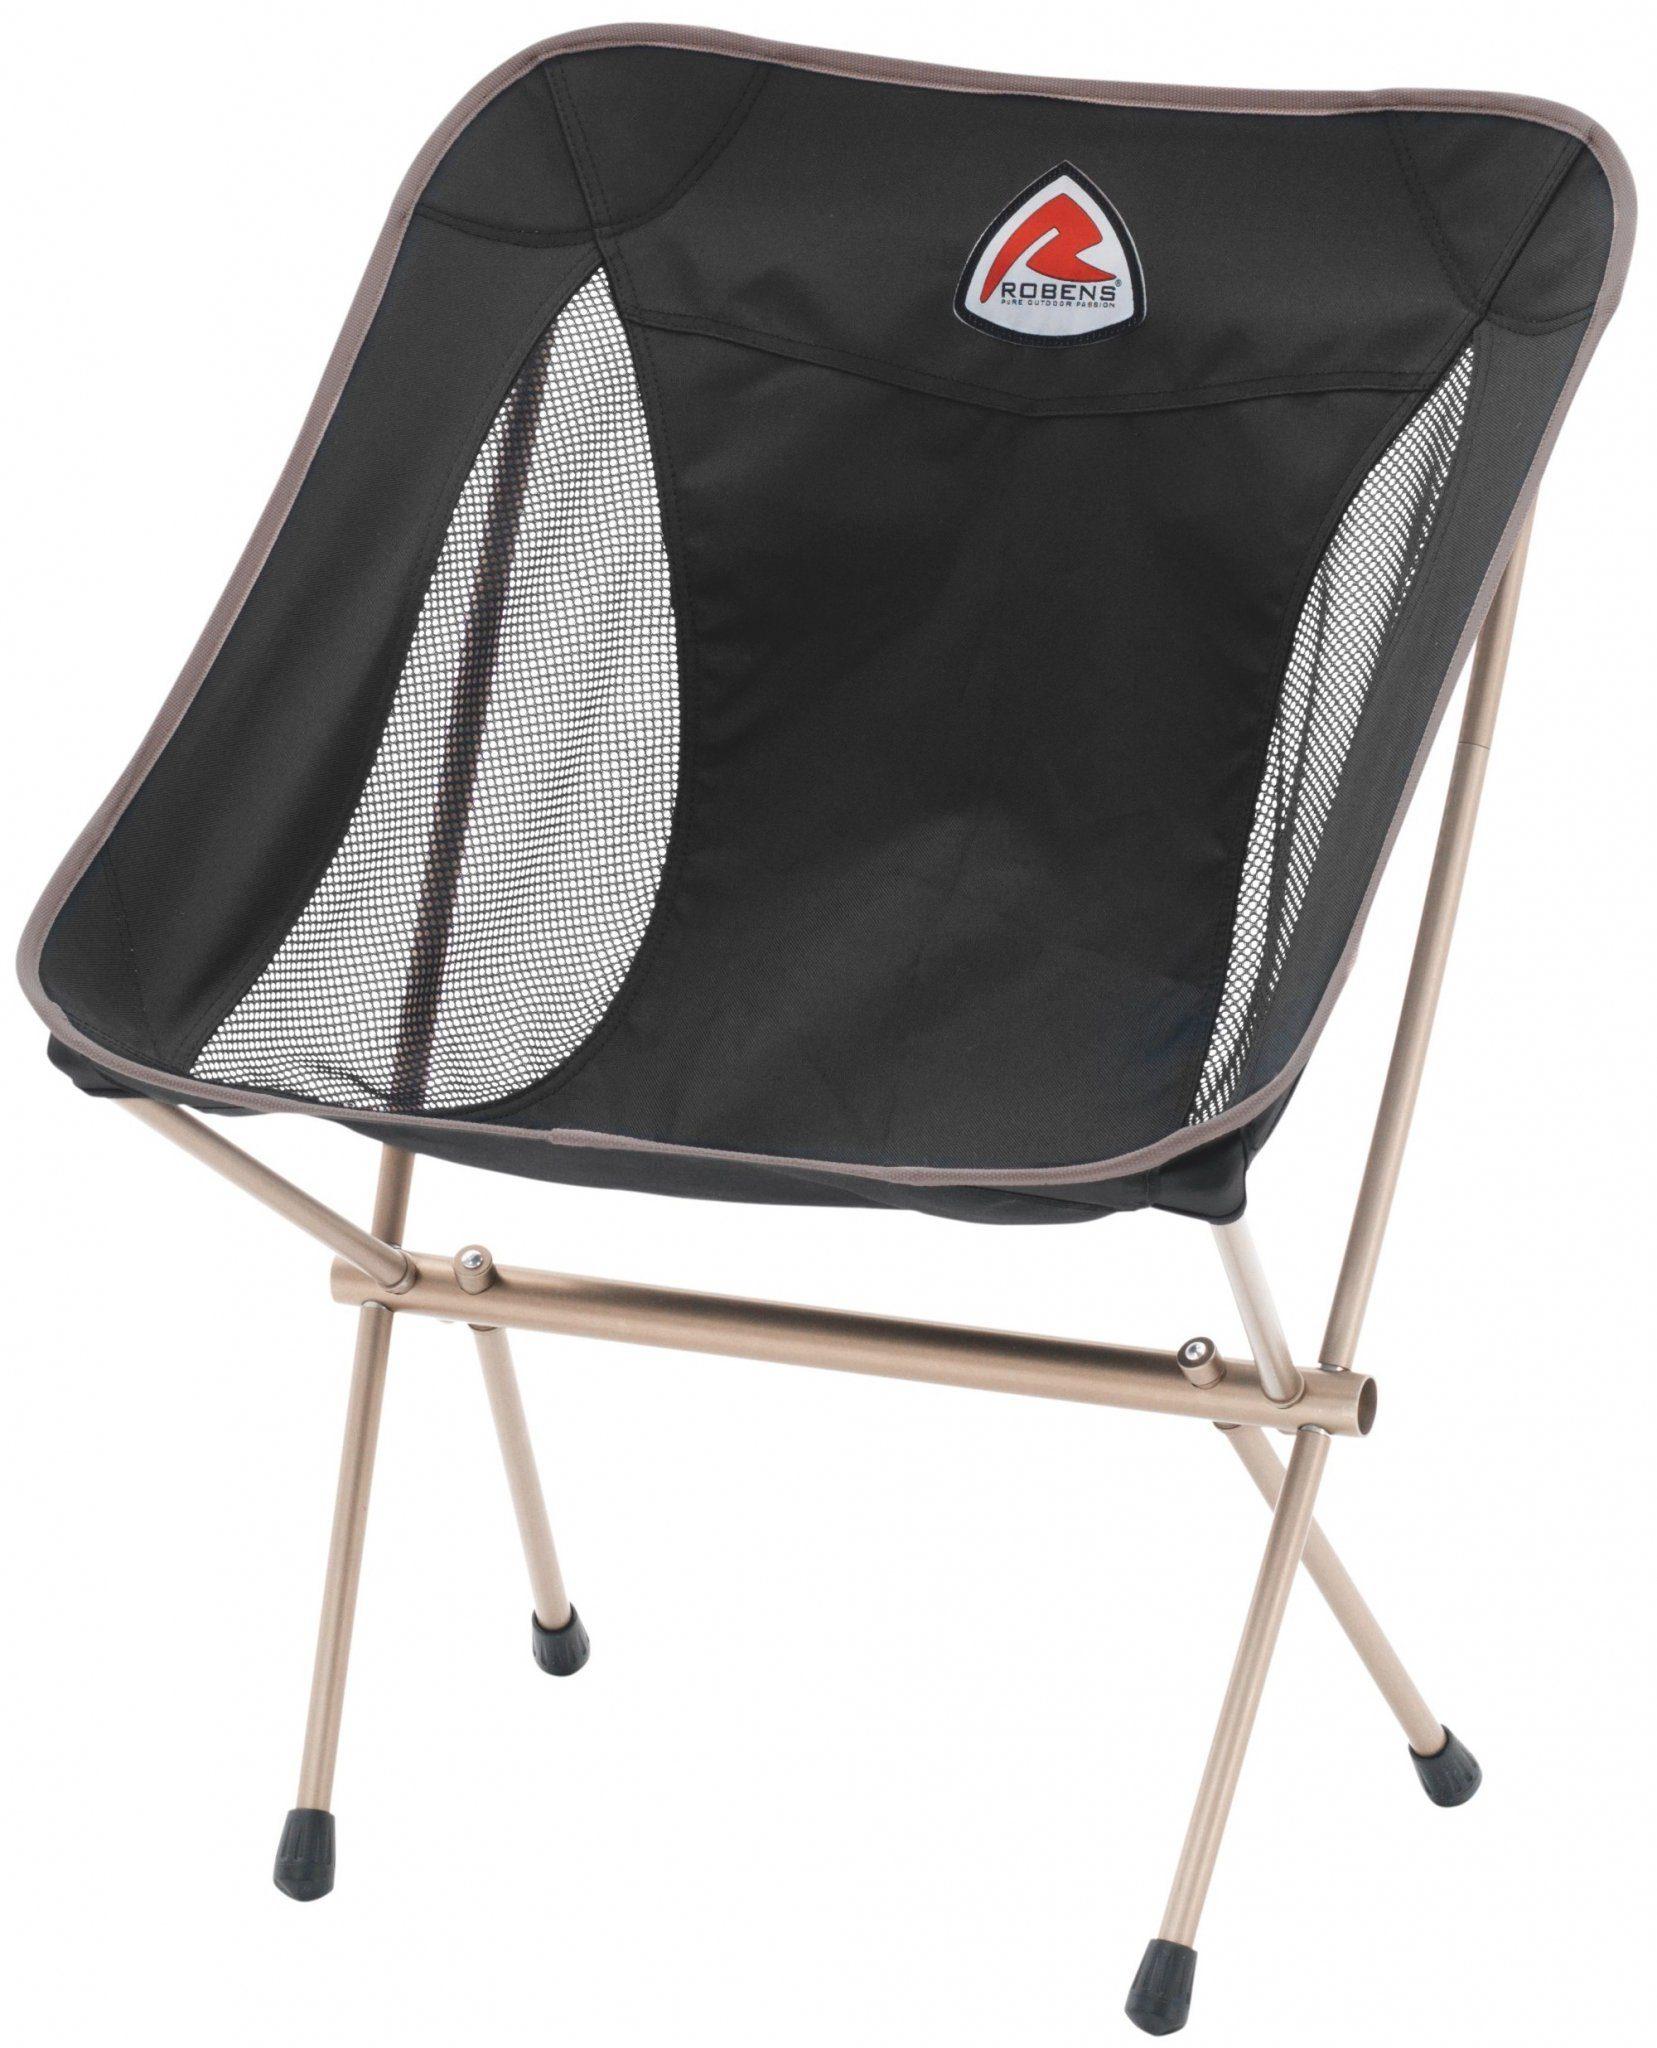 Robens Camping-Stuhl »Pathfinder Folding Chair«